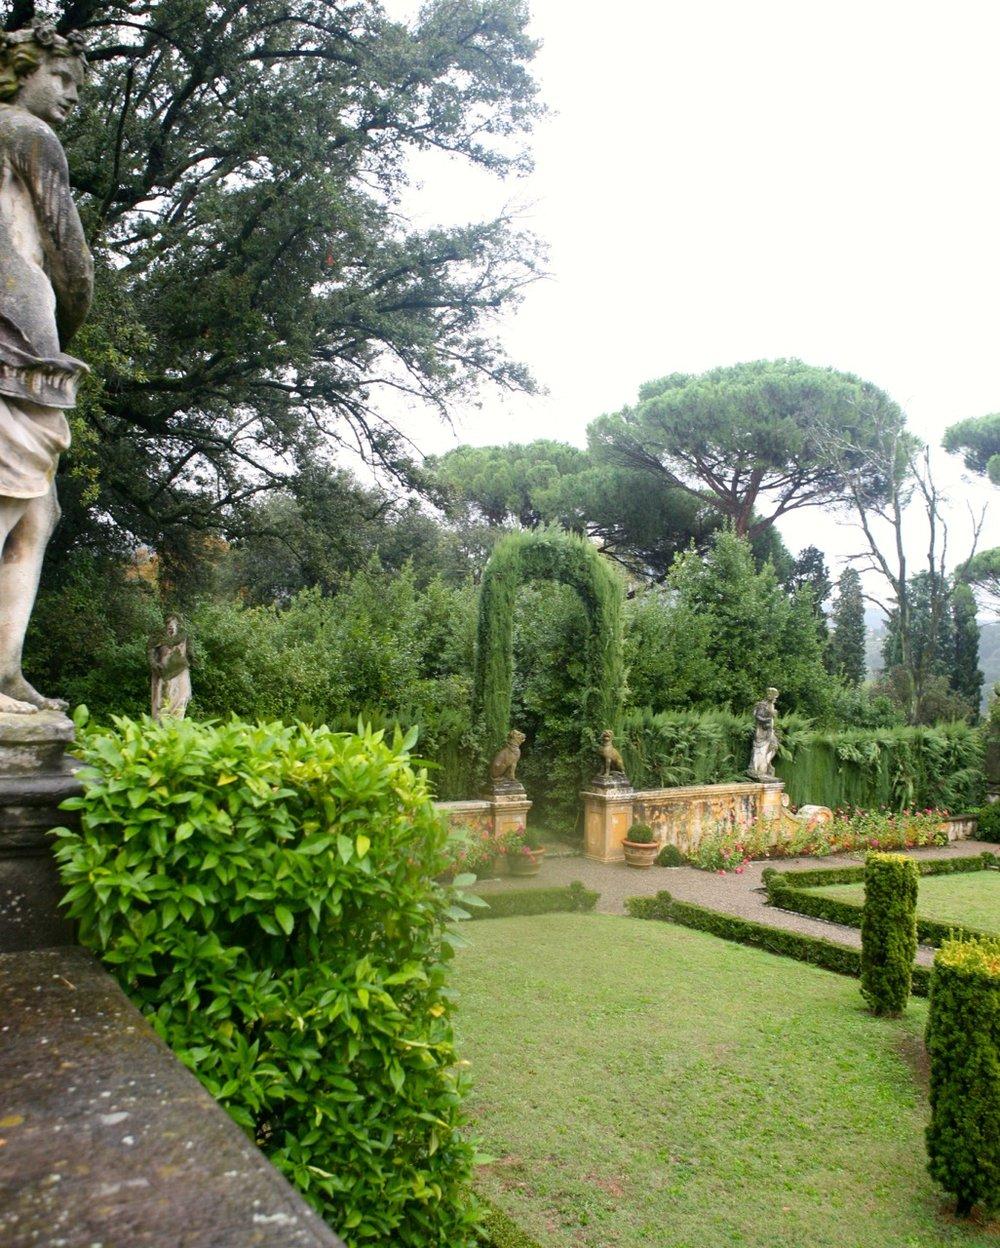 thegoodgarden|villaacton|villapietra|davidcalle|italy|0561.jpg